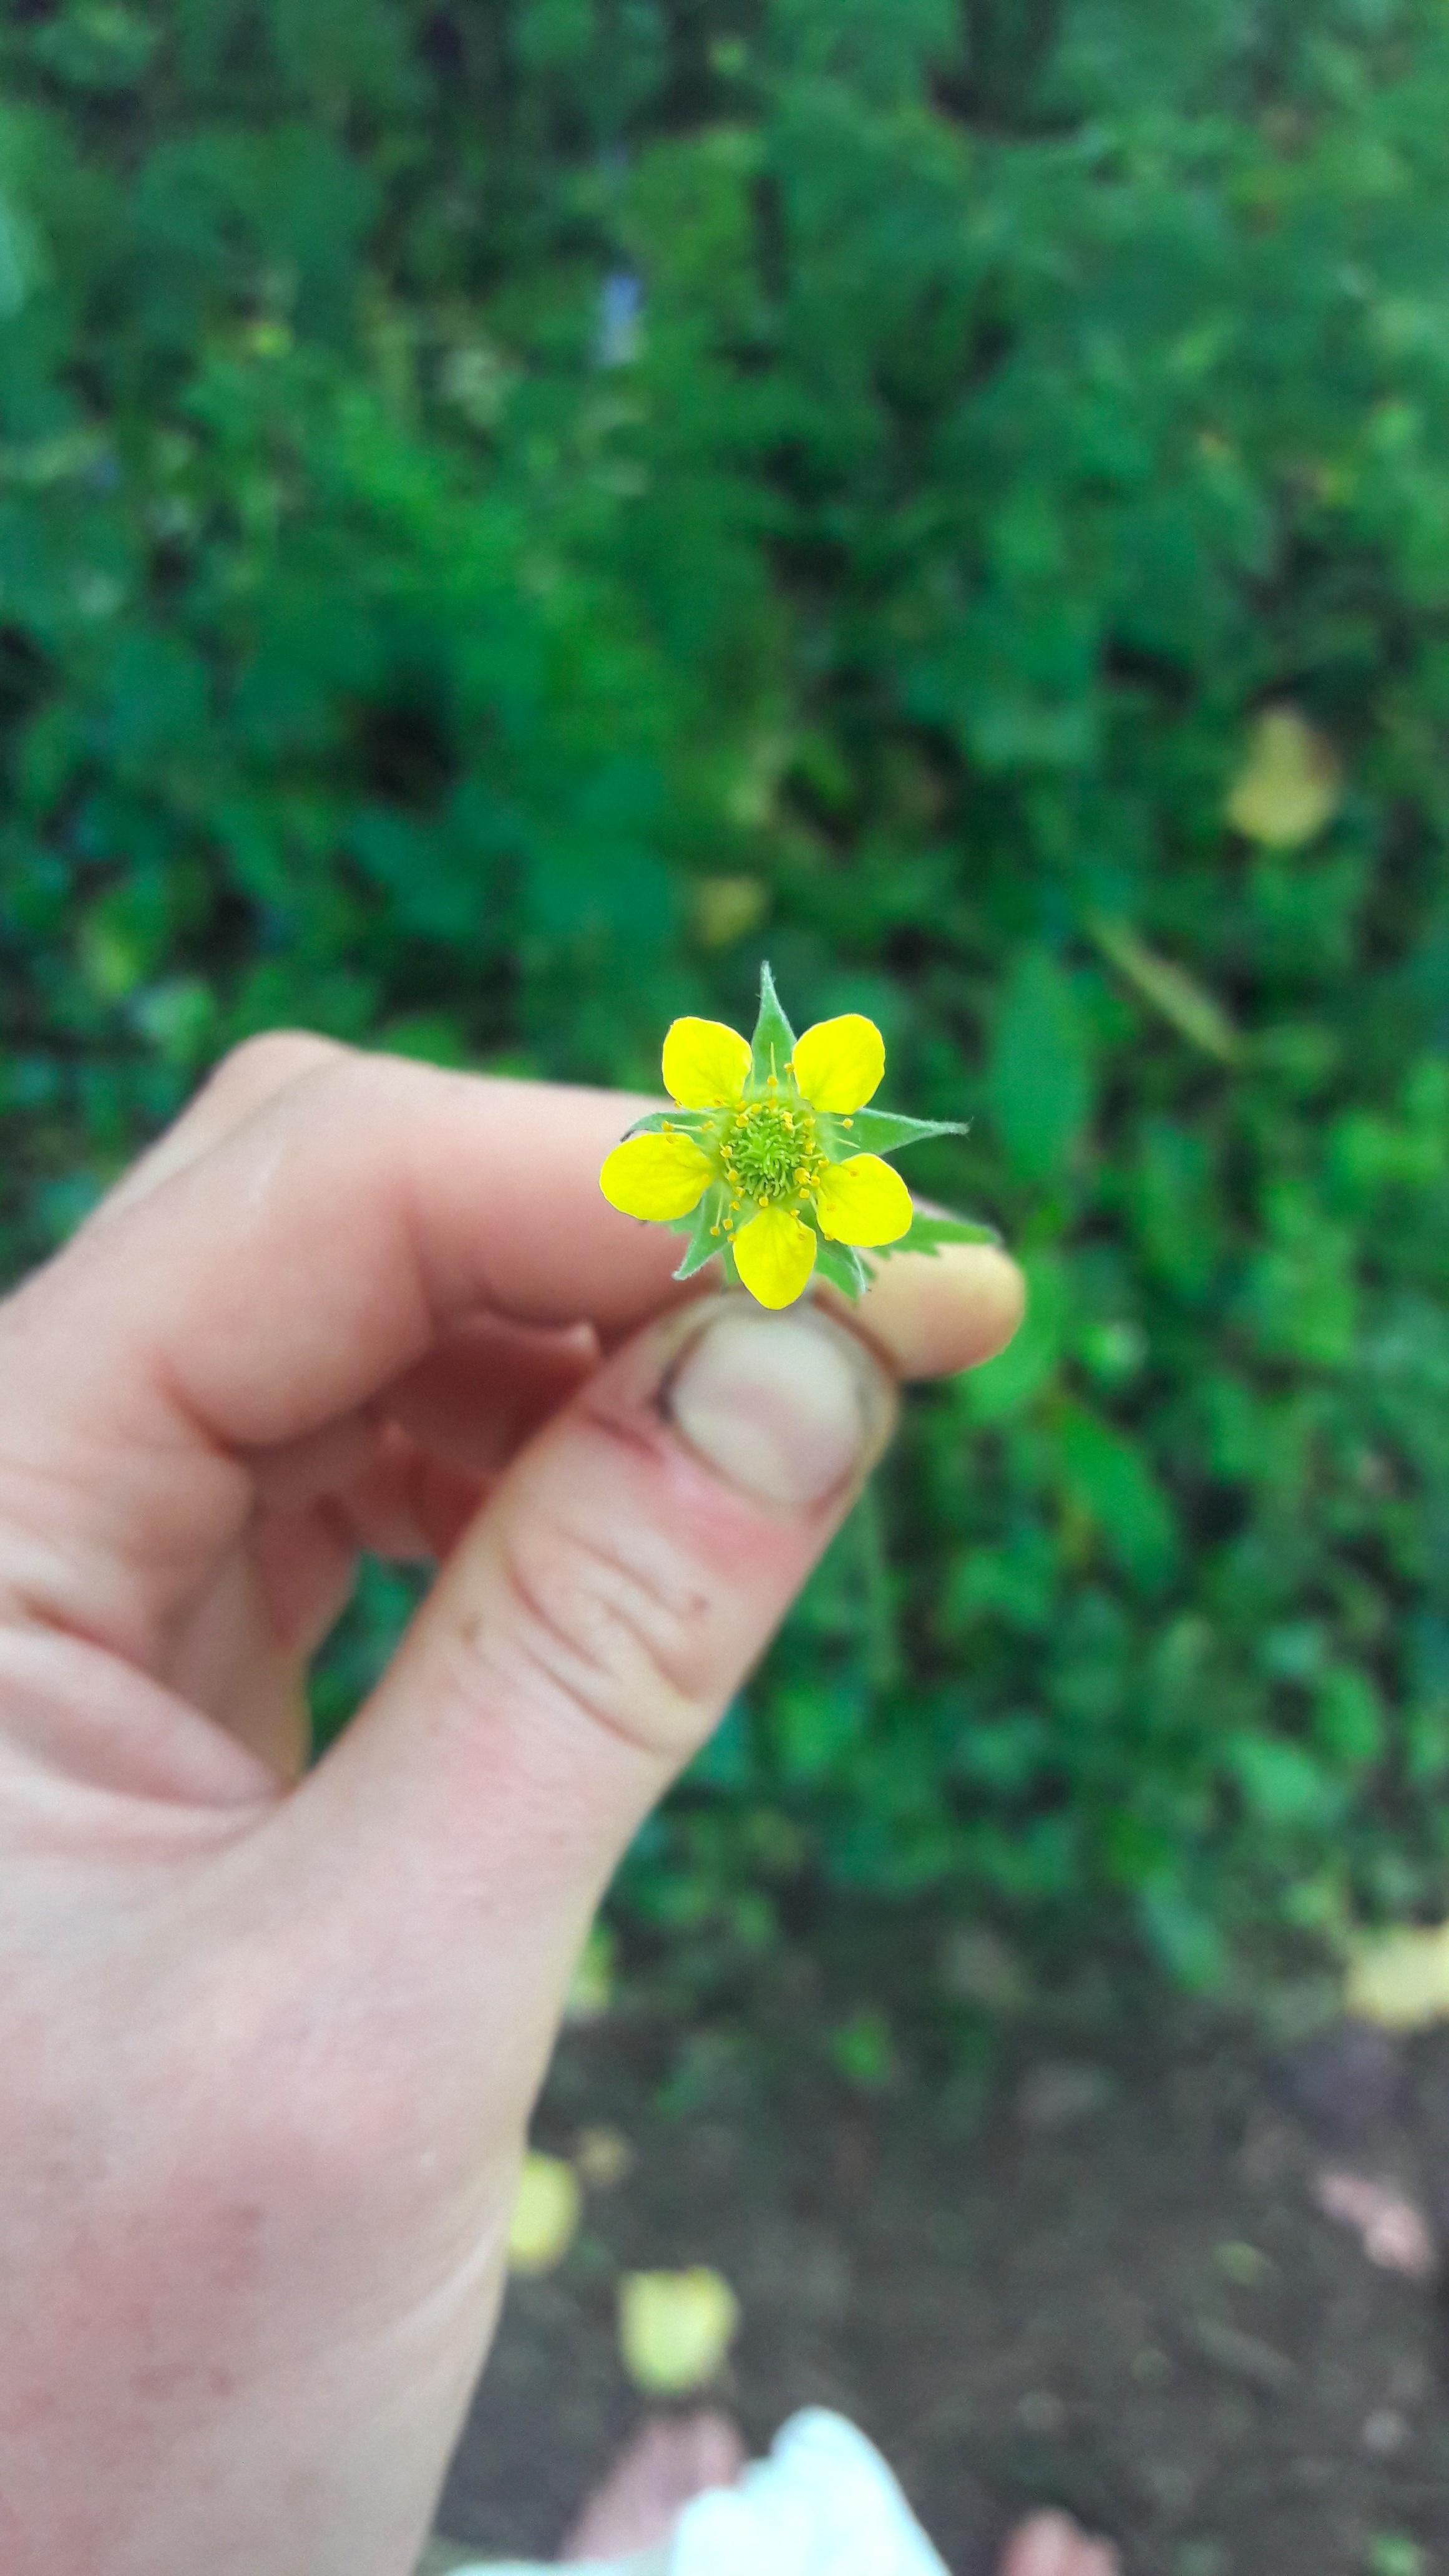 Wild Plant Walks - Explore wild natural dye plants and edible plants